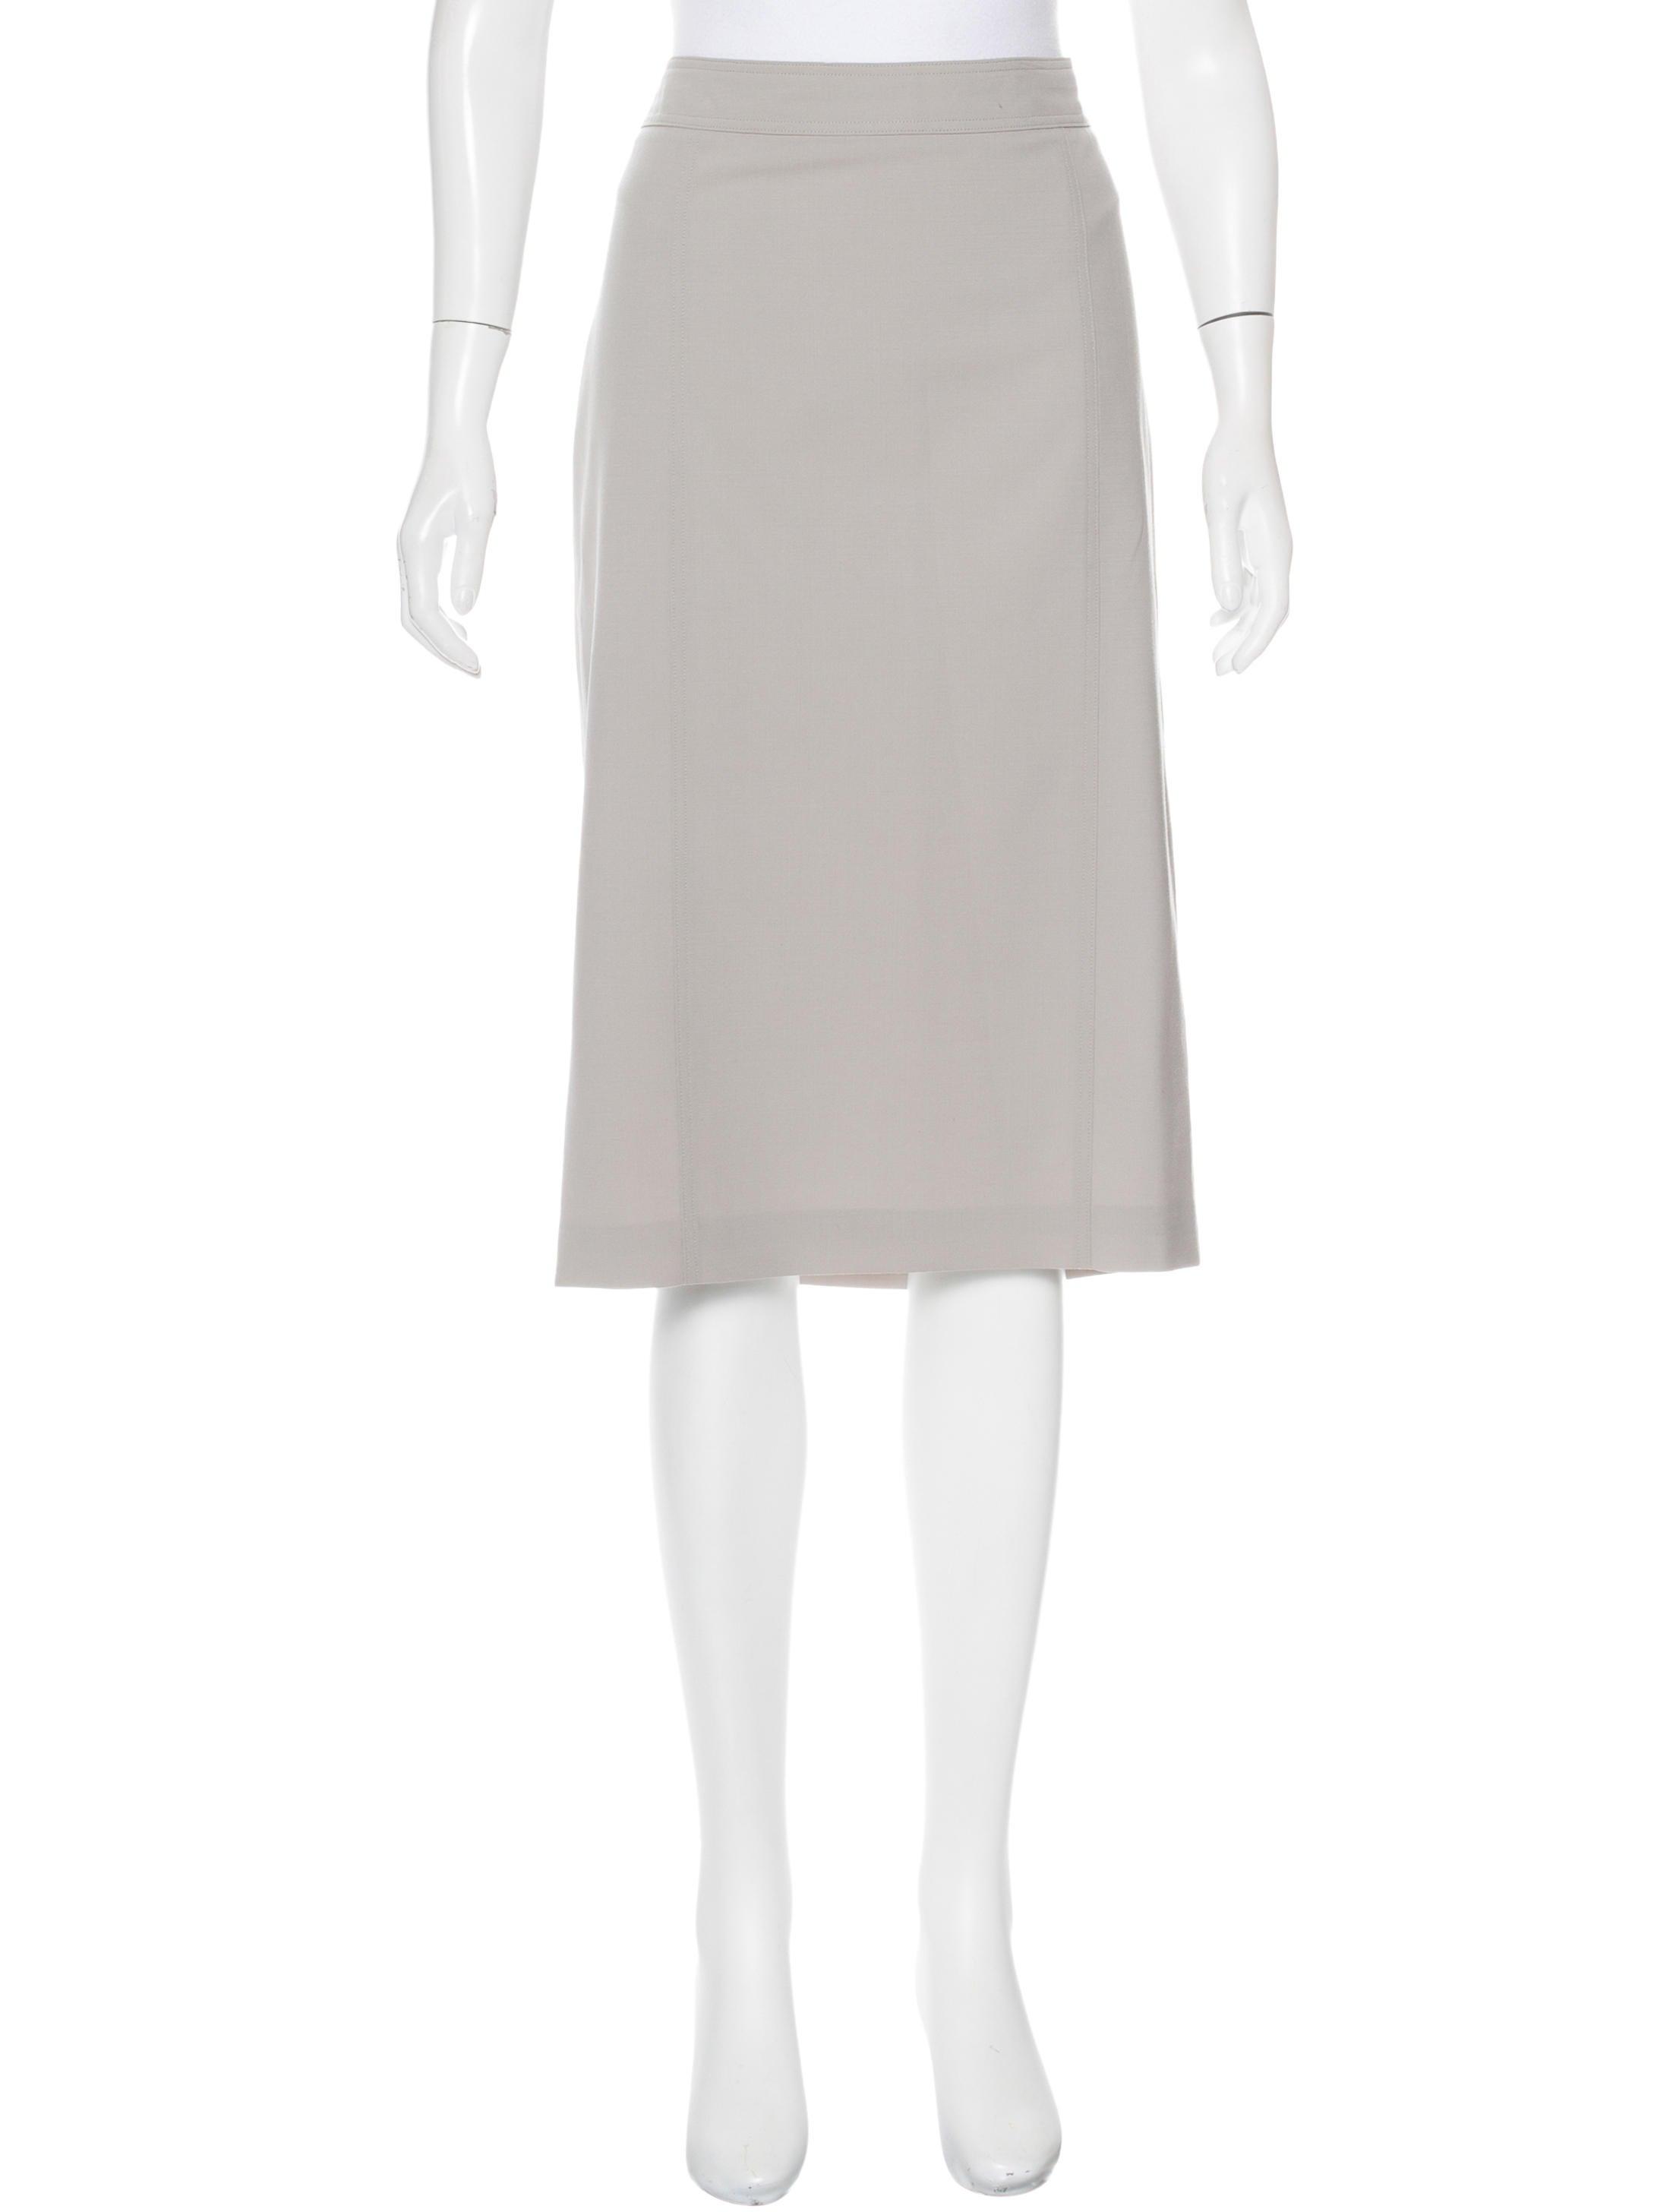 burberry wool knee length skirt clothing